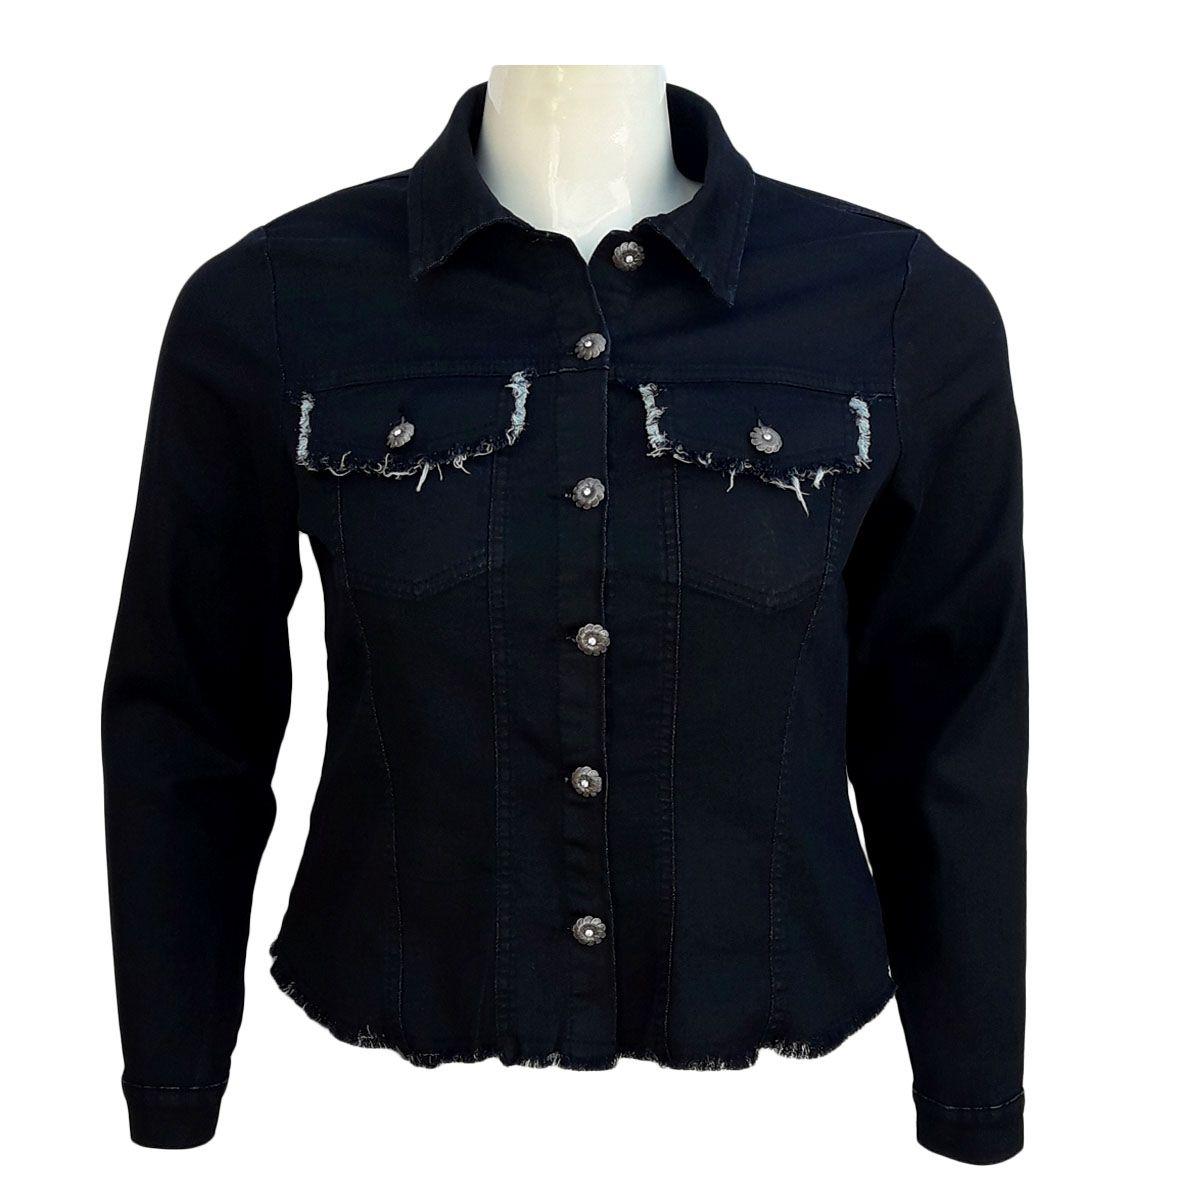 Jaqueta Jeans Malha Denim Feminina Desfiada Plus Size